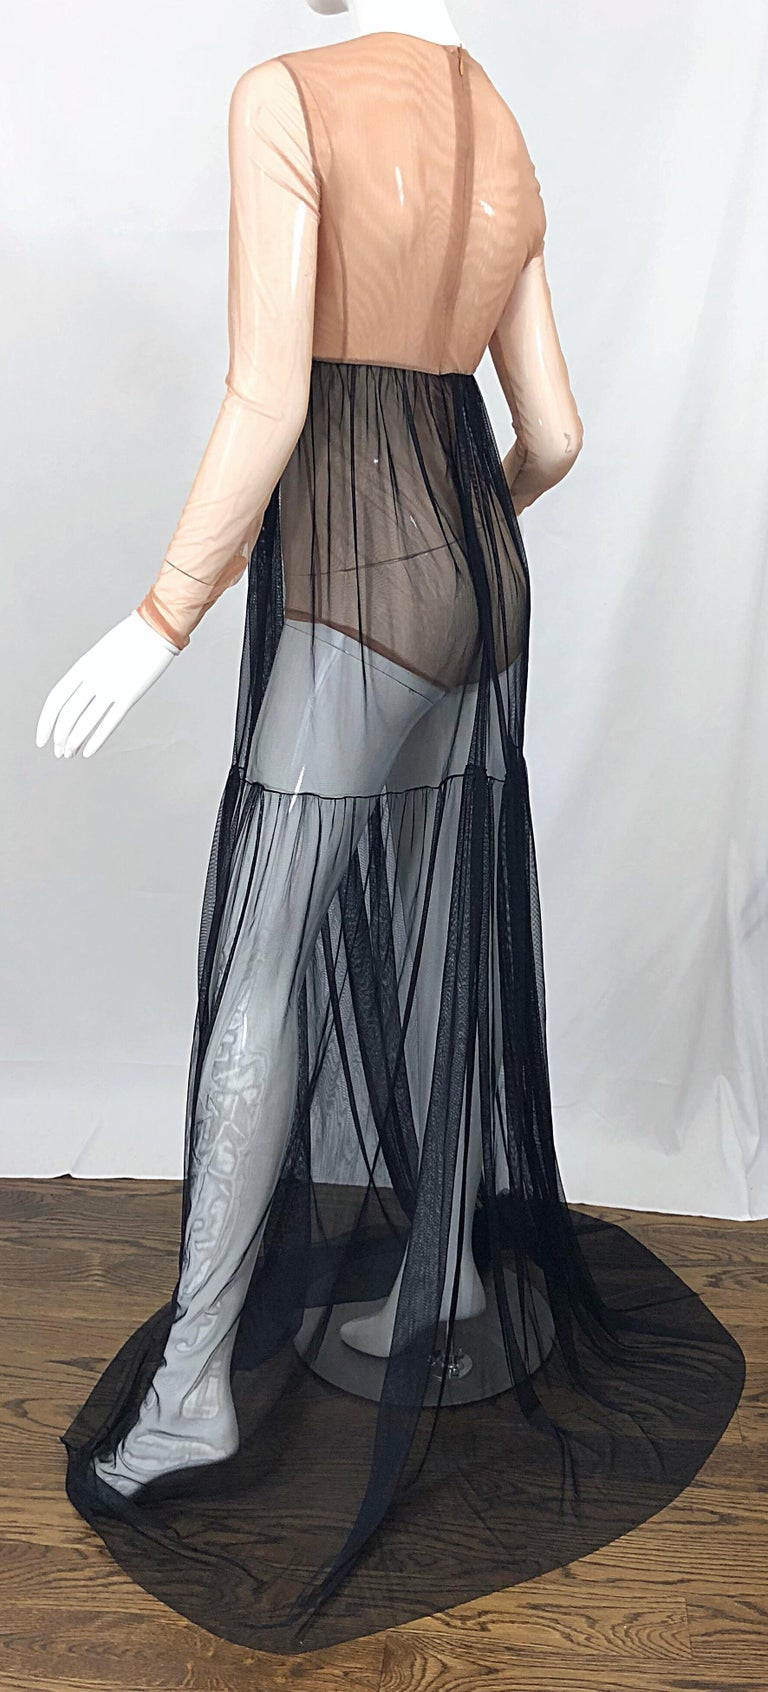 Michael Kors Collection Sz 4 Nude + Black Sheer Runway Mesh Bodysuit Gown Dress For Sale 3